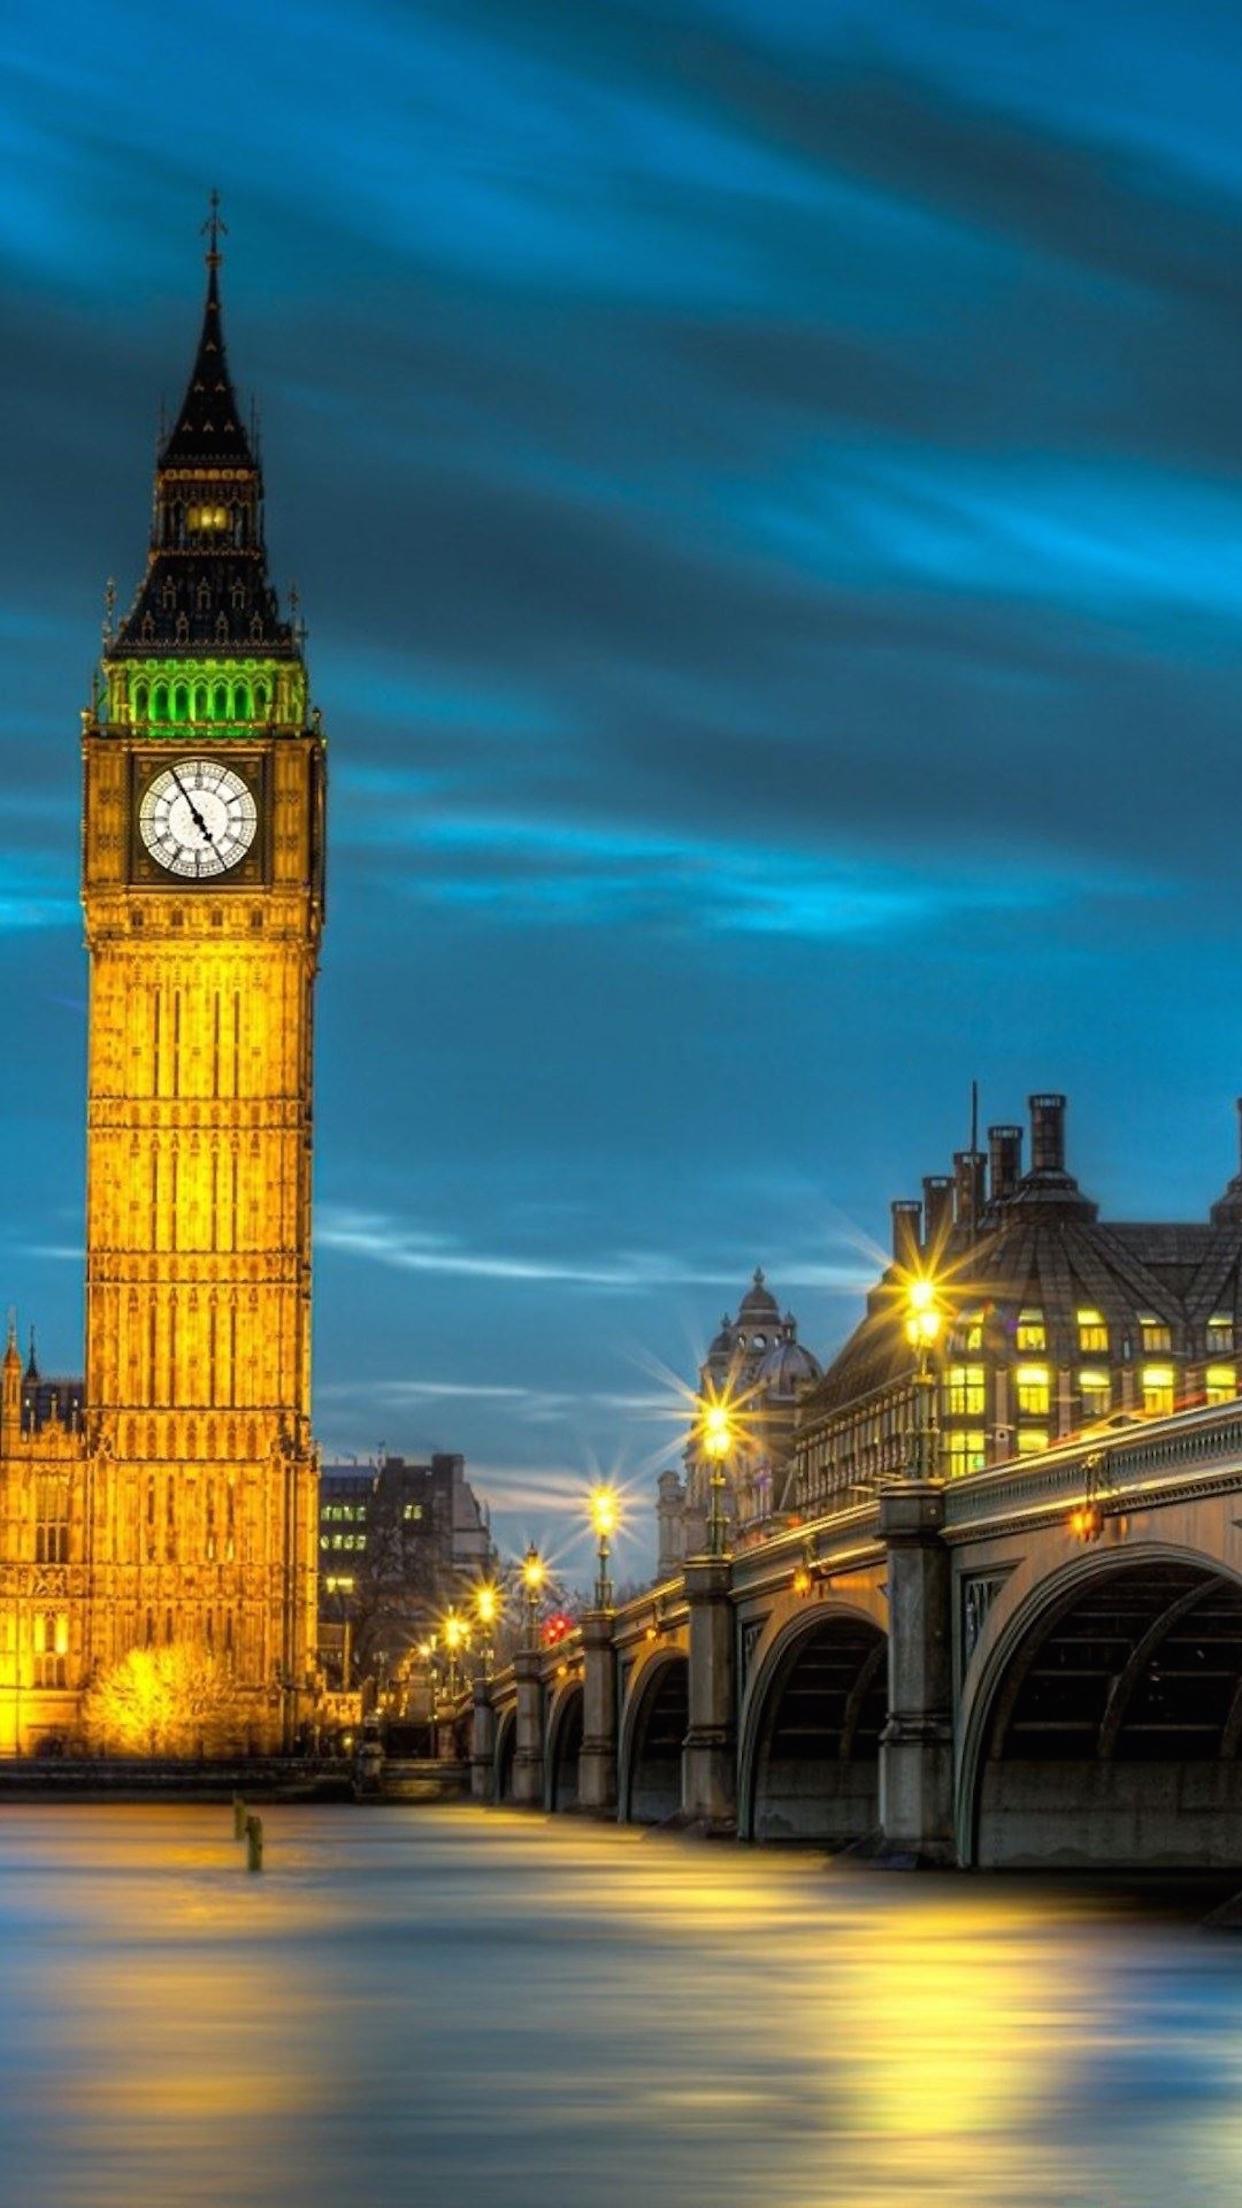 London Big Ben 3Wallpapers iPhone Parallax1 Les 3Wallpapers iPhone du jour (21/08/2015)